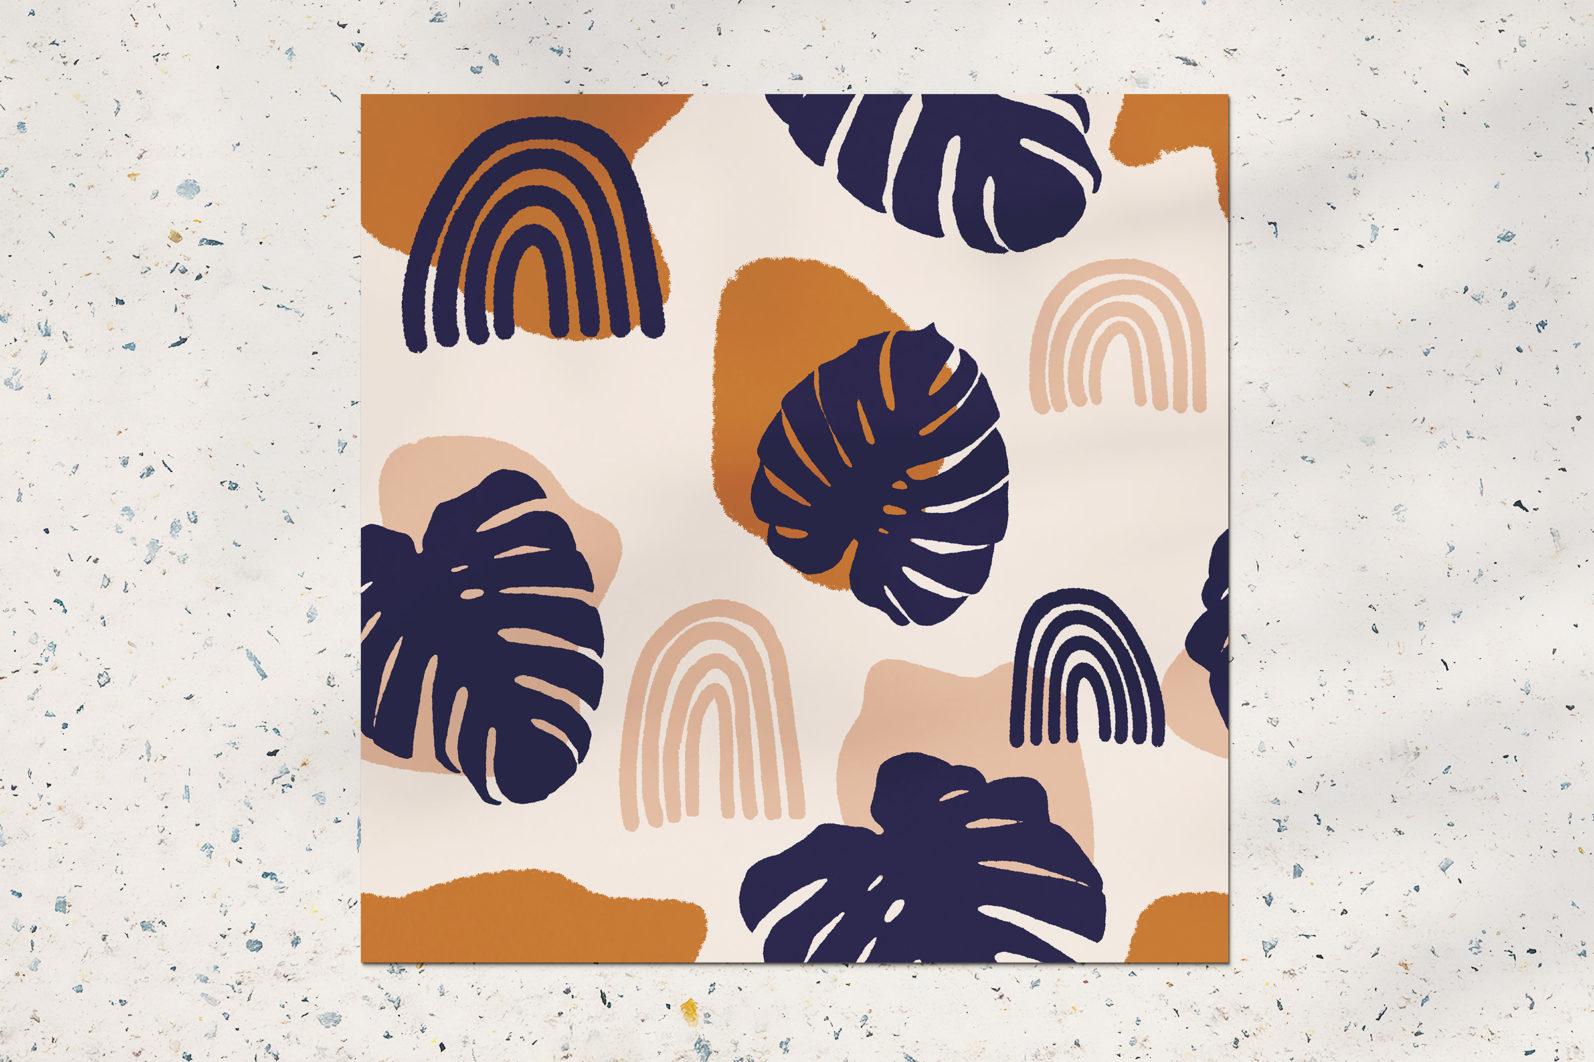 Palm leaves seamless pattern - CREATIVE MARKET2 5 -